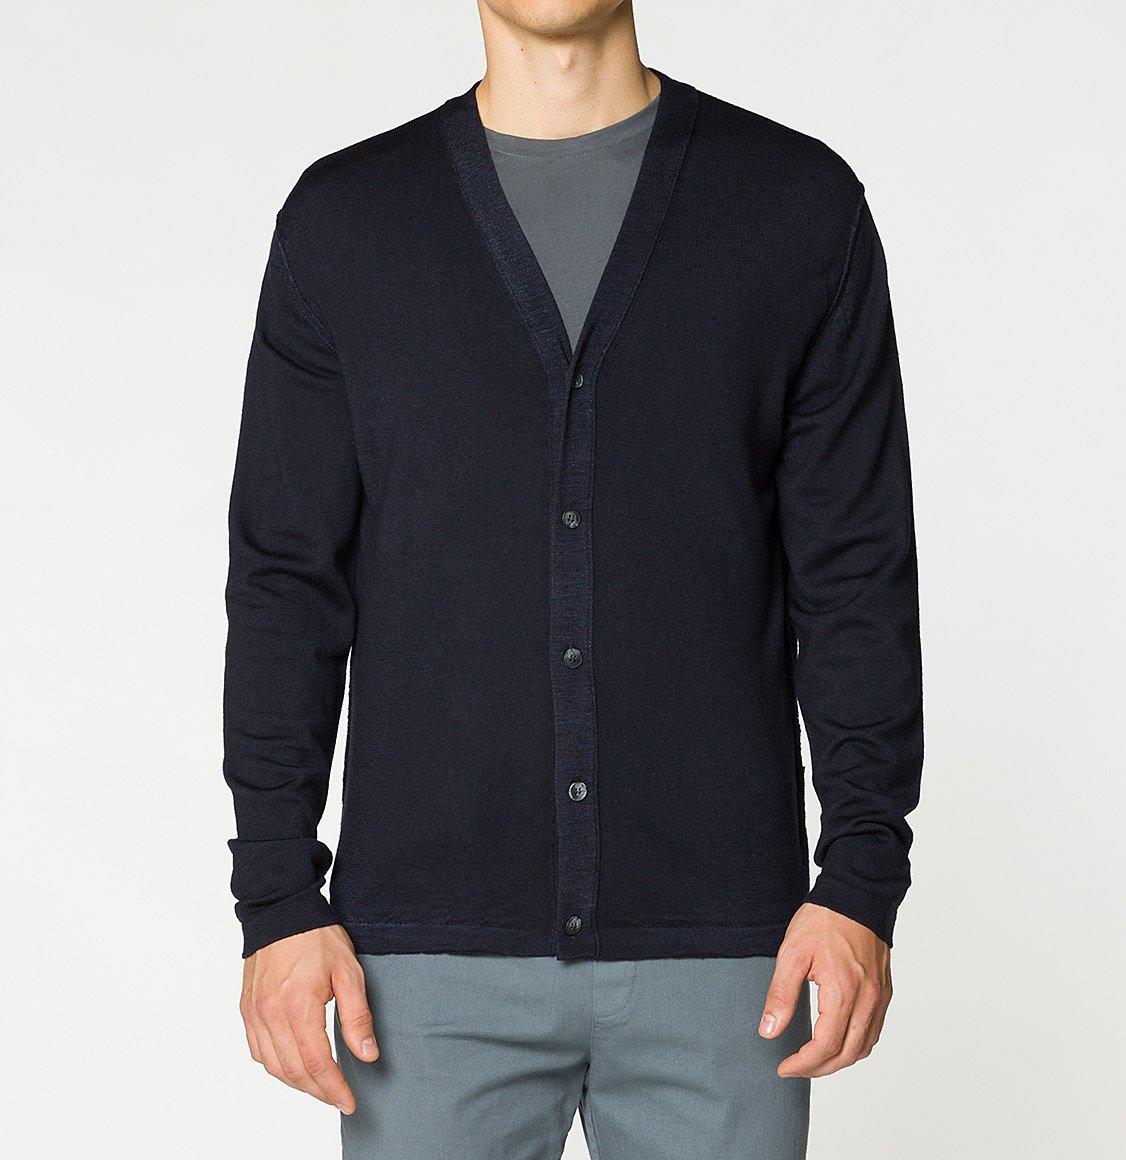 The Project Garments Virgin Wool Cardigan Navy Blue